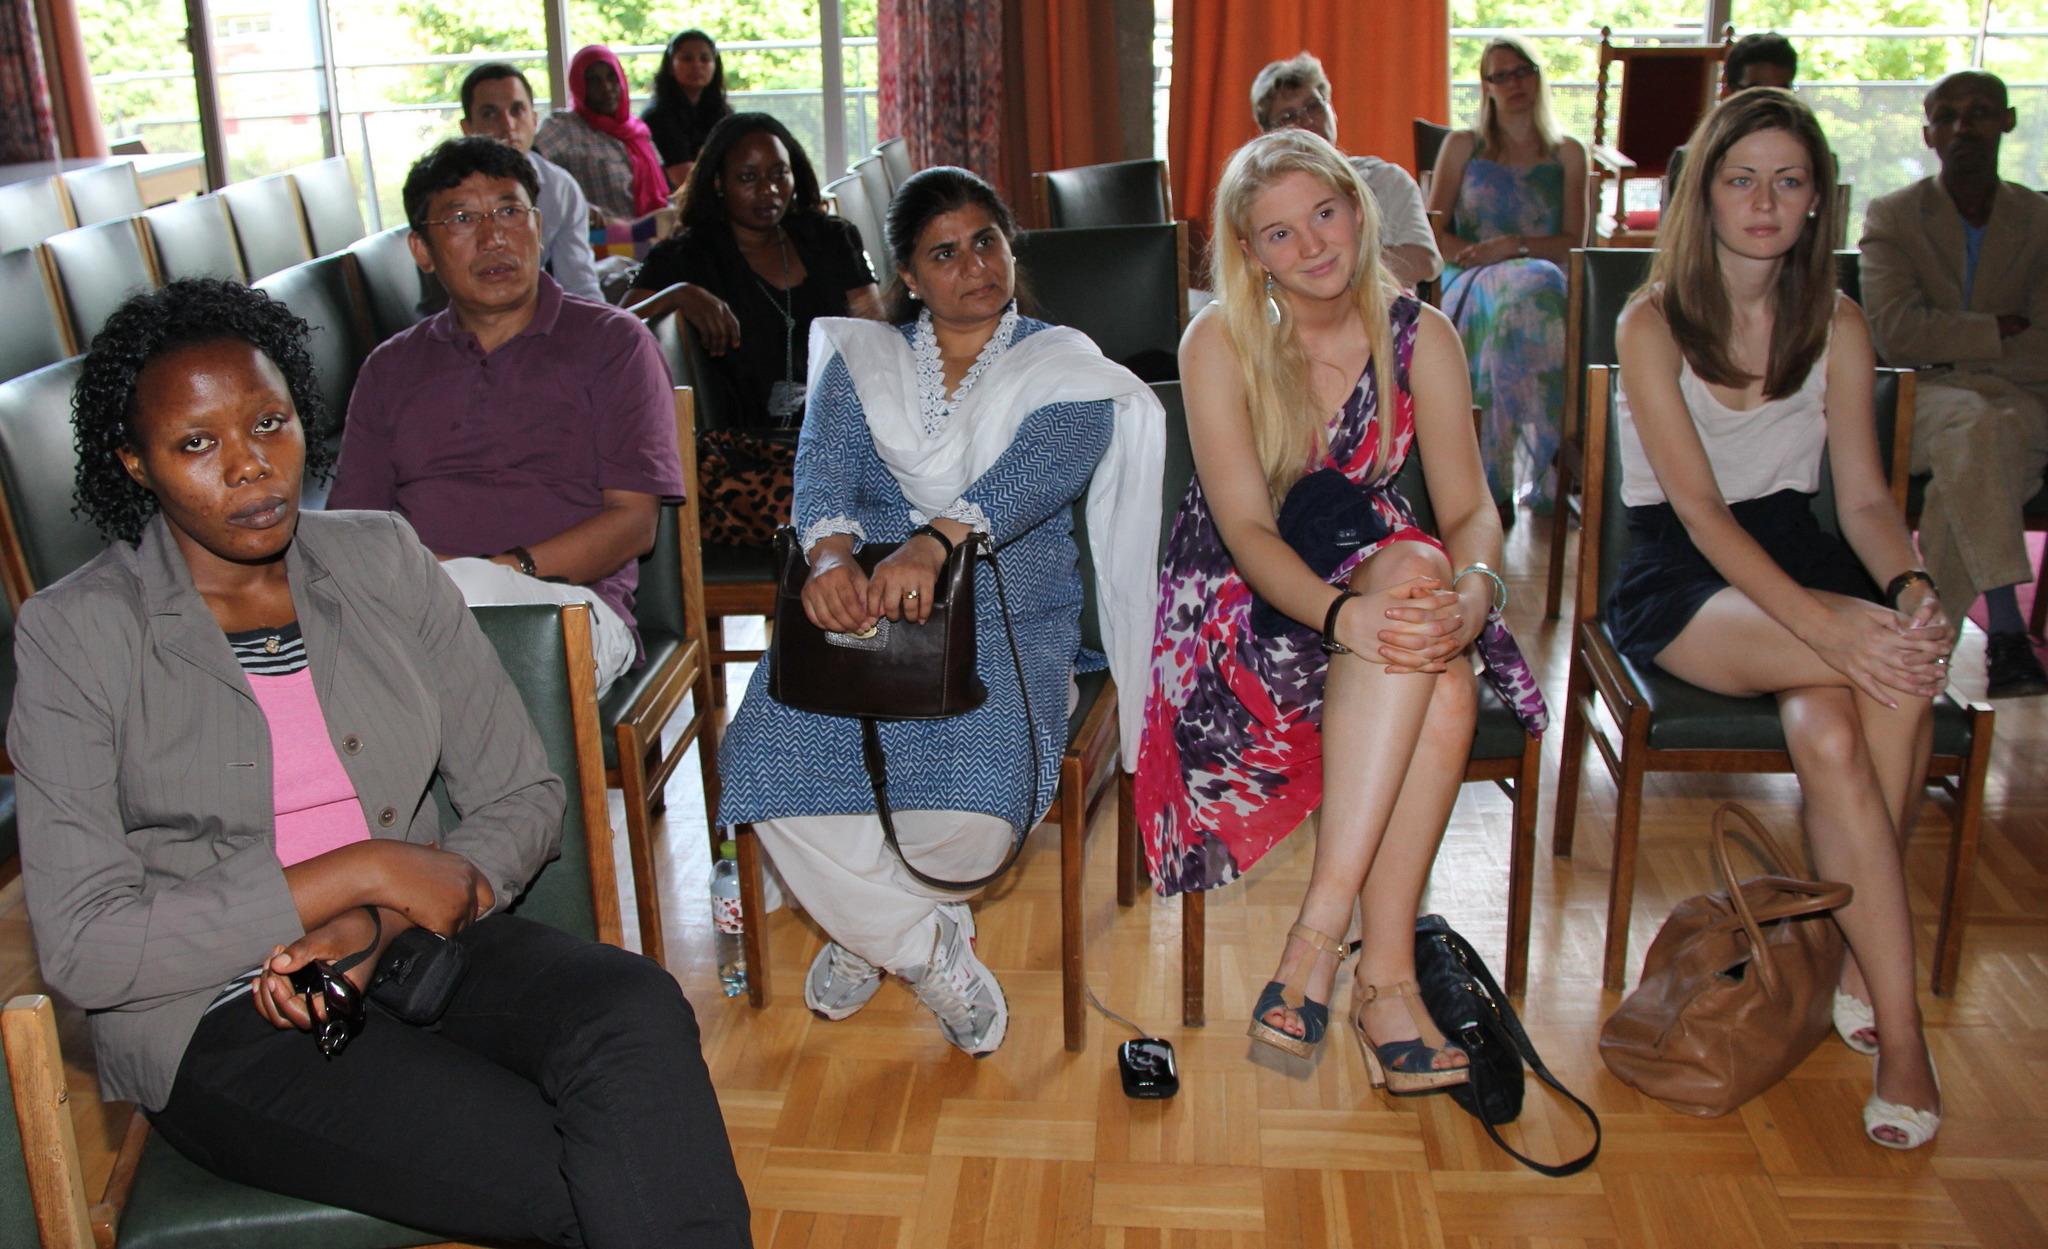 Partnerschaften & Kontakte in Ebensee - kostenlose